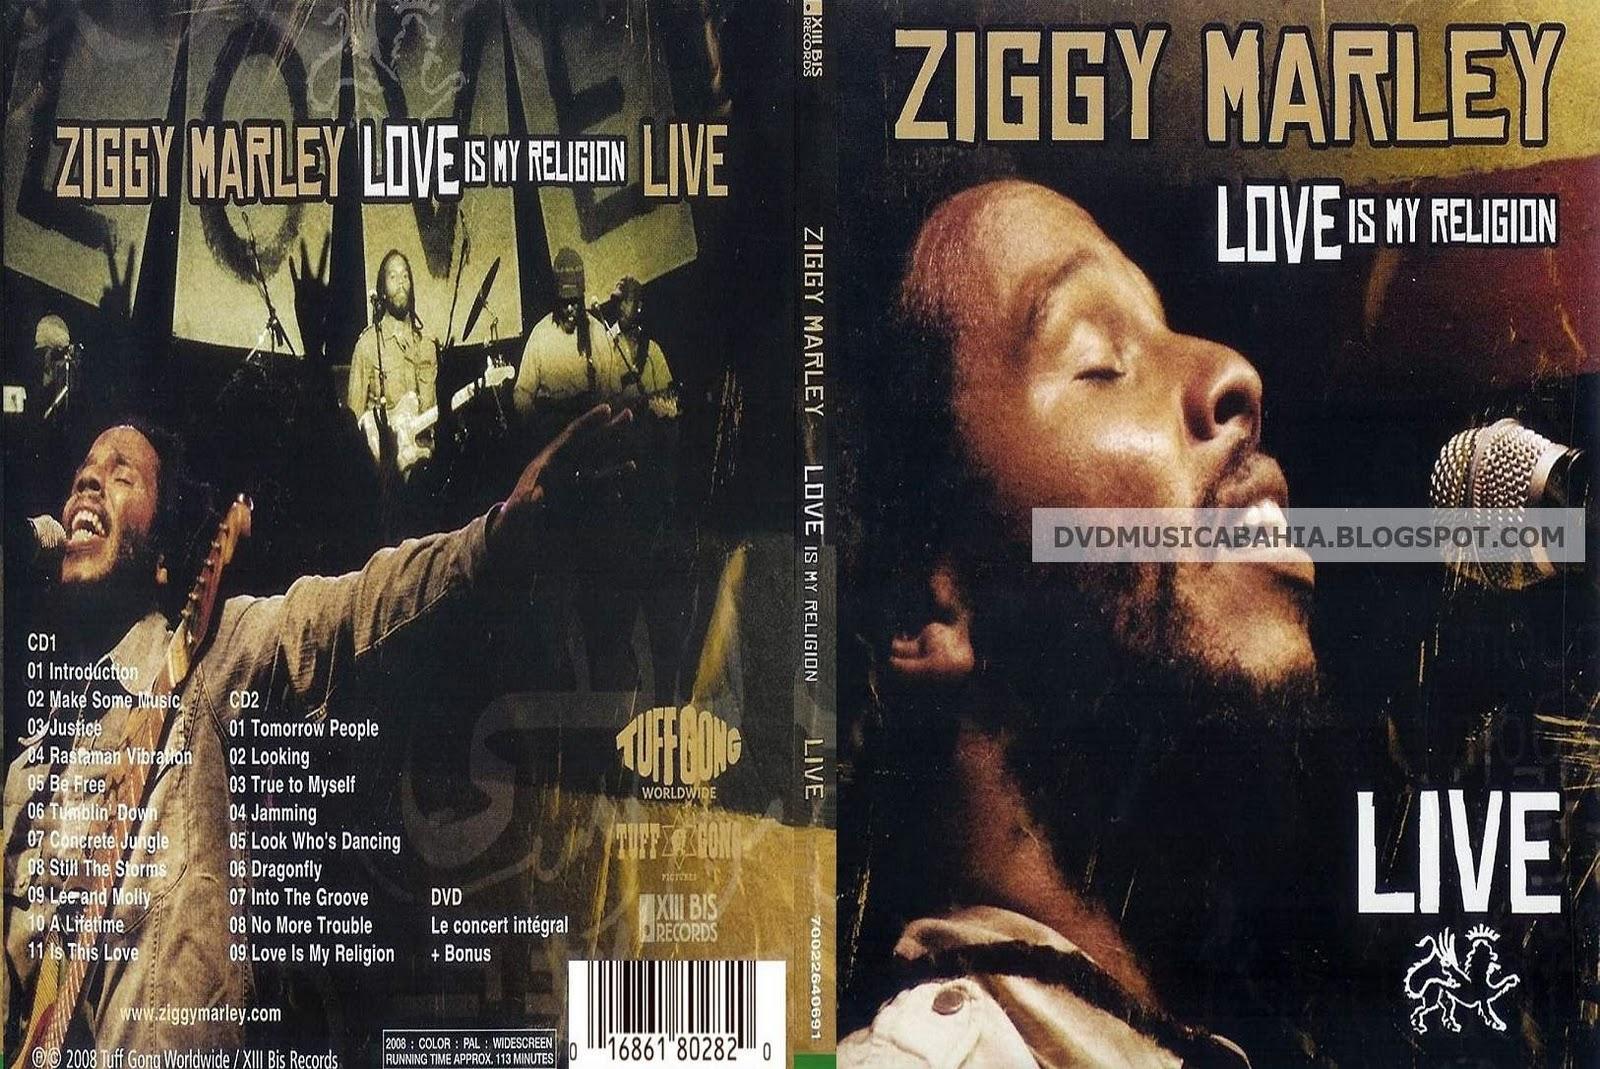 http://2.bp.blogspot.com/-4veQMbC3pMg/TZp5-RzfNGI/AAAAAAAABjk/kIiLDRjDCiY/s1600/Ziggy+Marley+-+Love+Is+My+Religion+Live.jpg